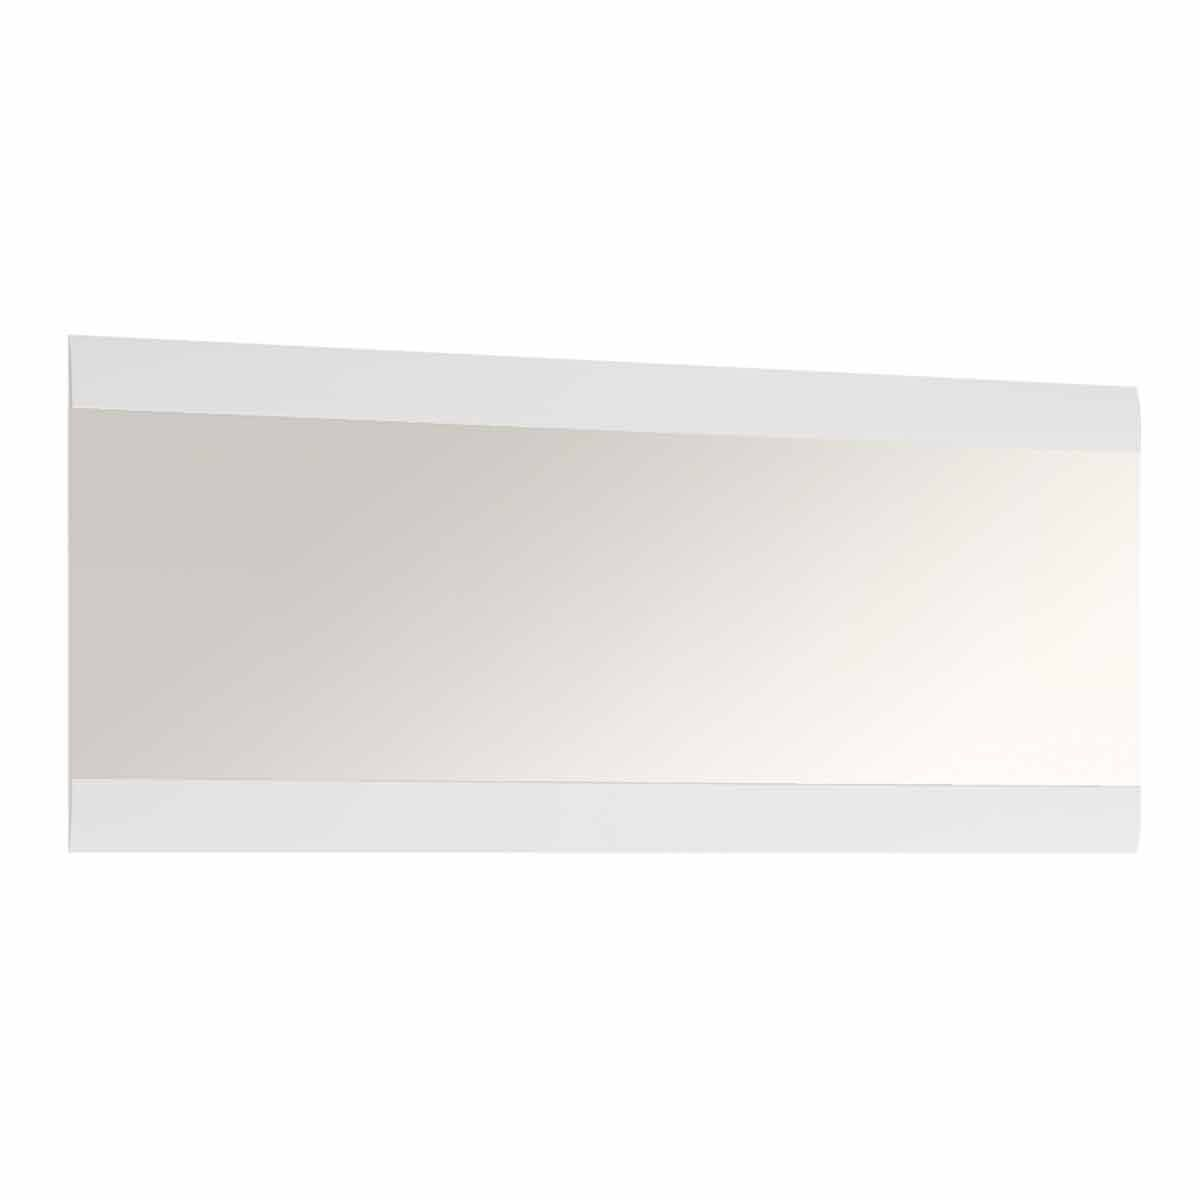 Chelsea Wall Mirror 164cm